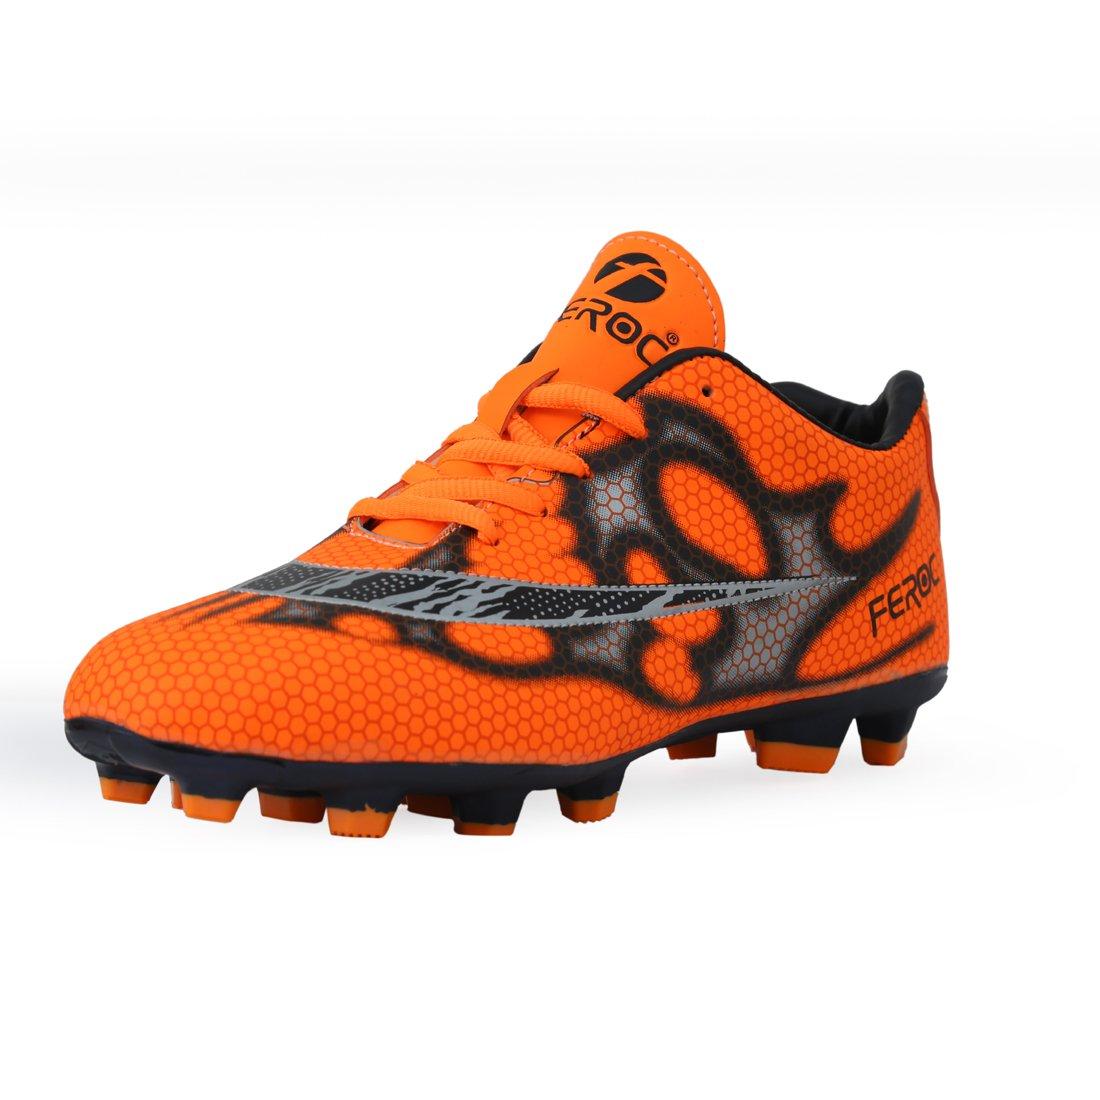 Amazon price history for Feroc Evospeed Men's Multicolour Football Shoes (9)